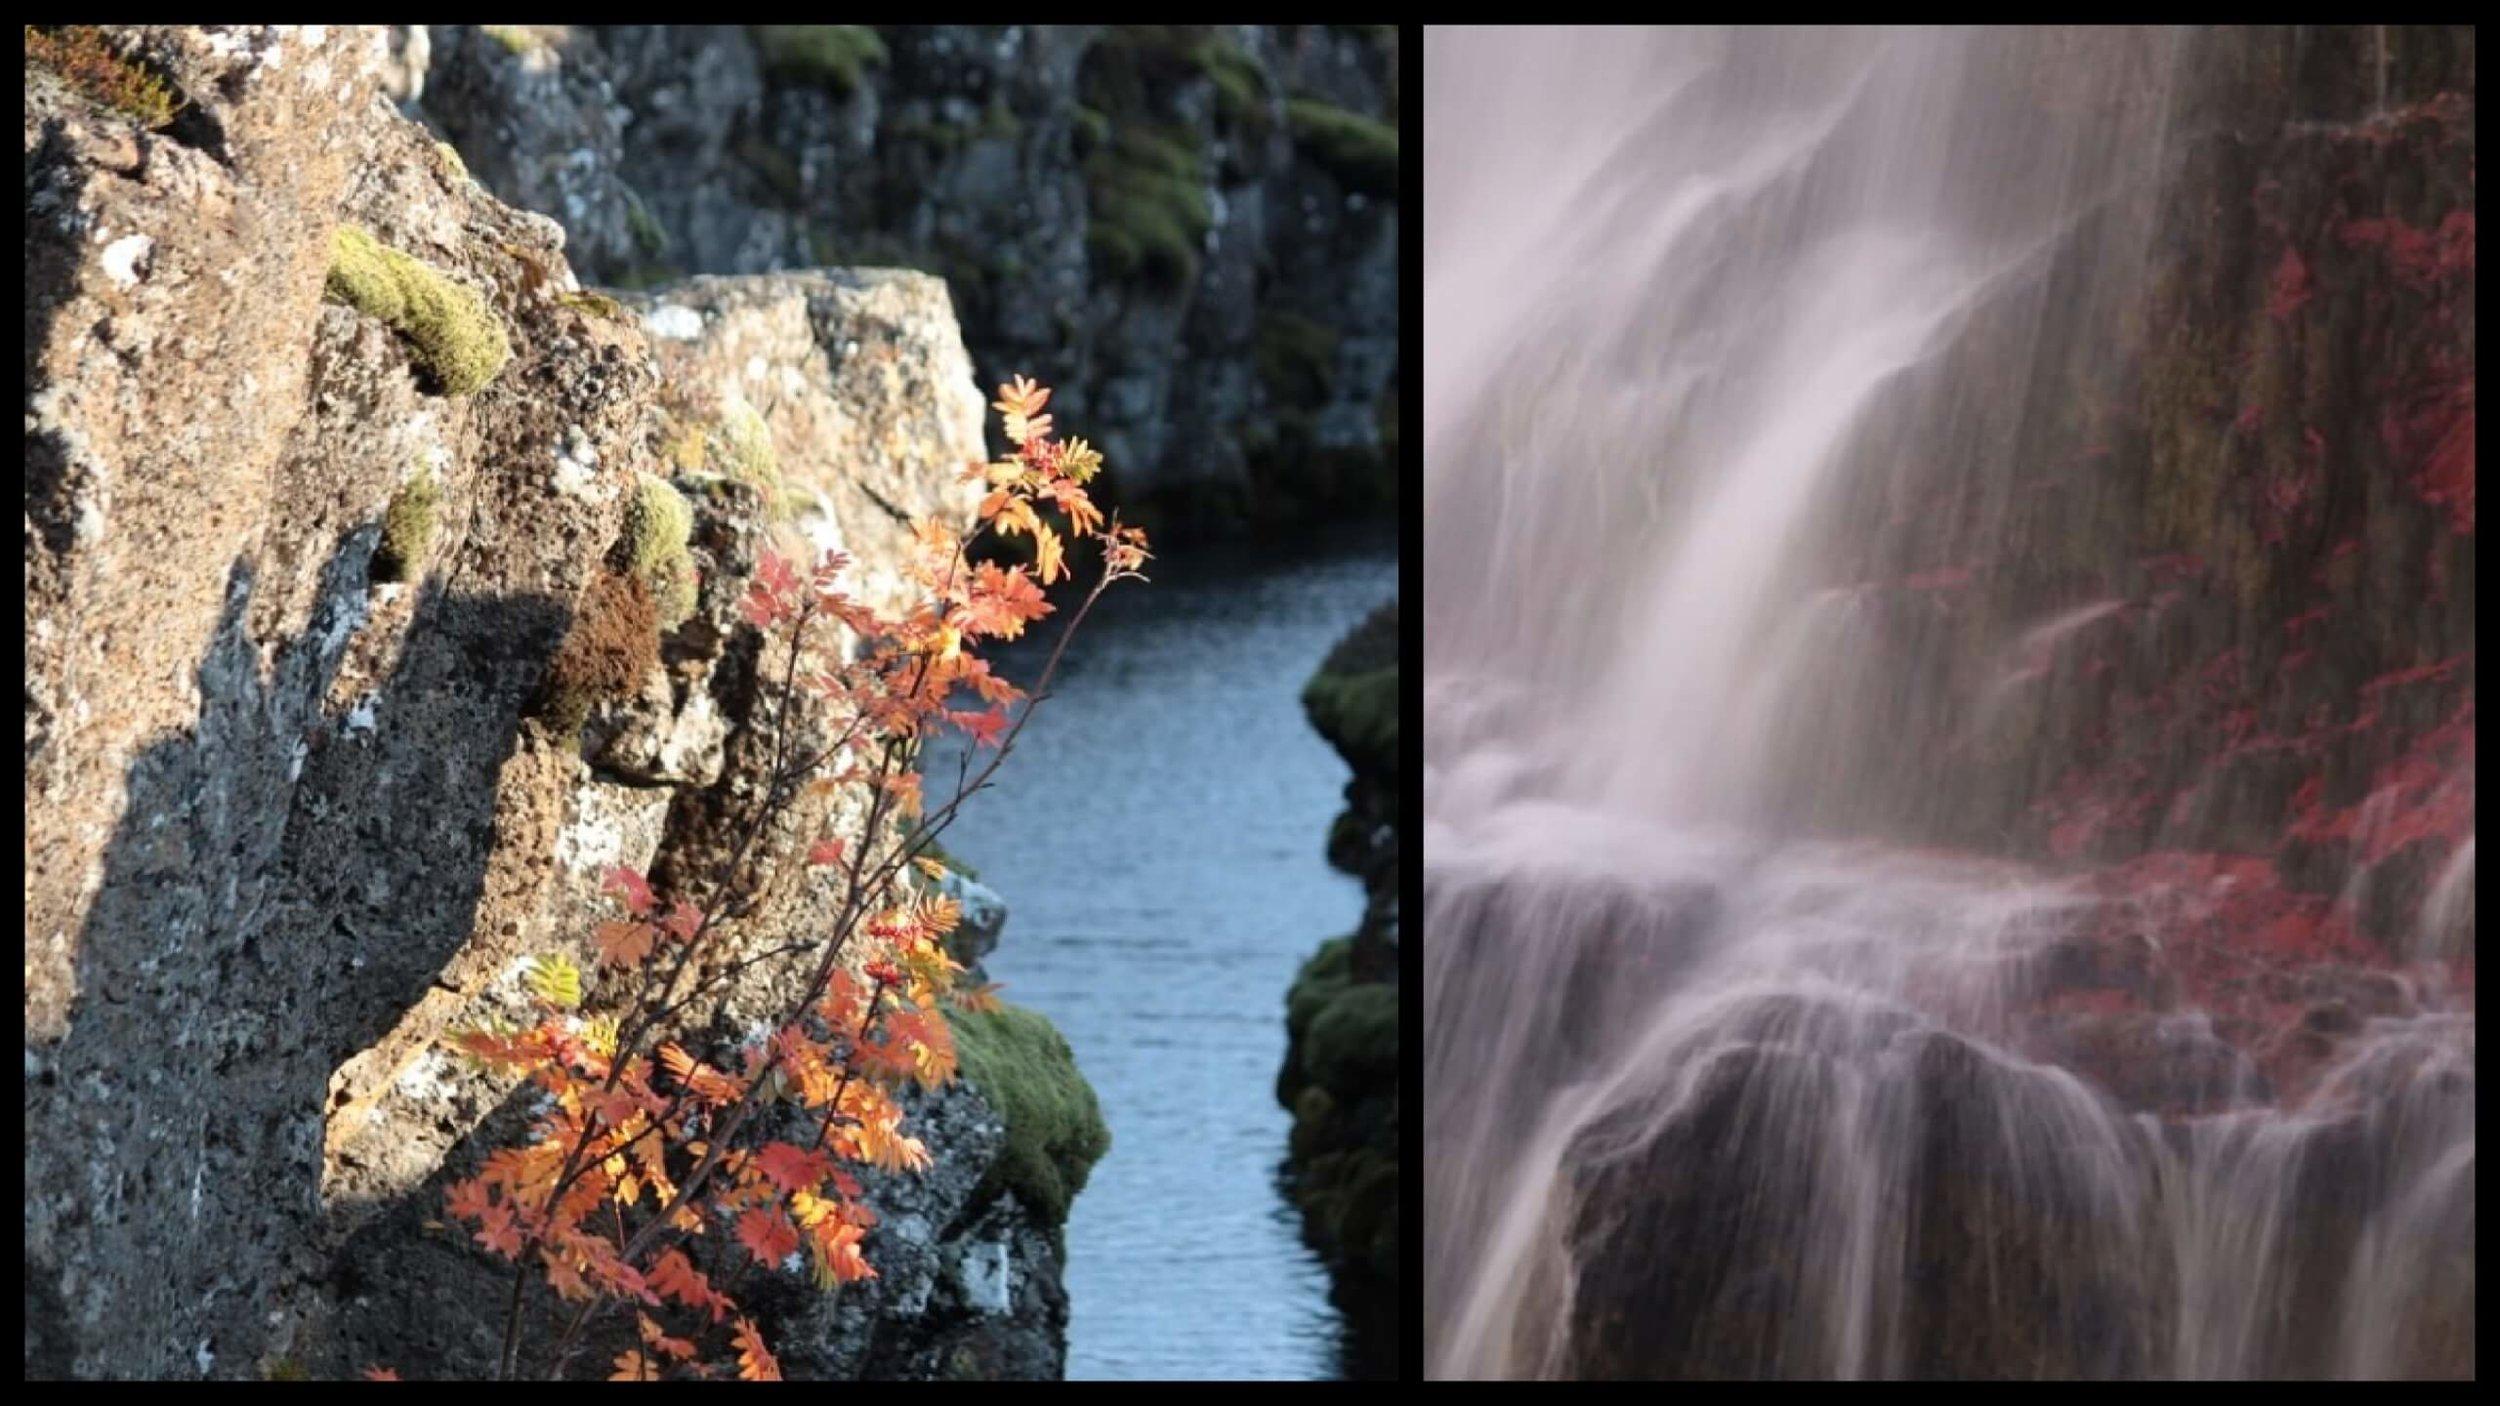 Beautiful Icelandic landscape and volcanic rock. Credit: Margret Hallmundsdóttir.